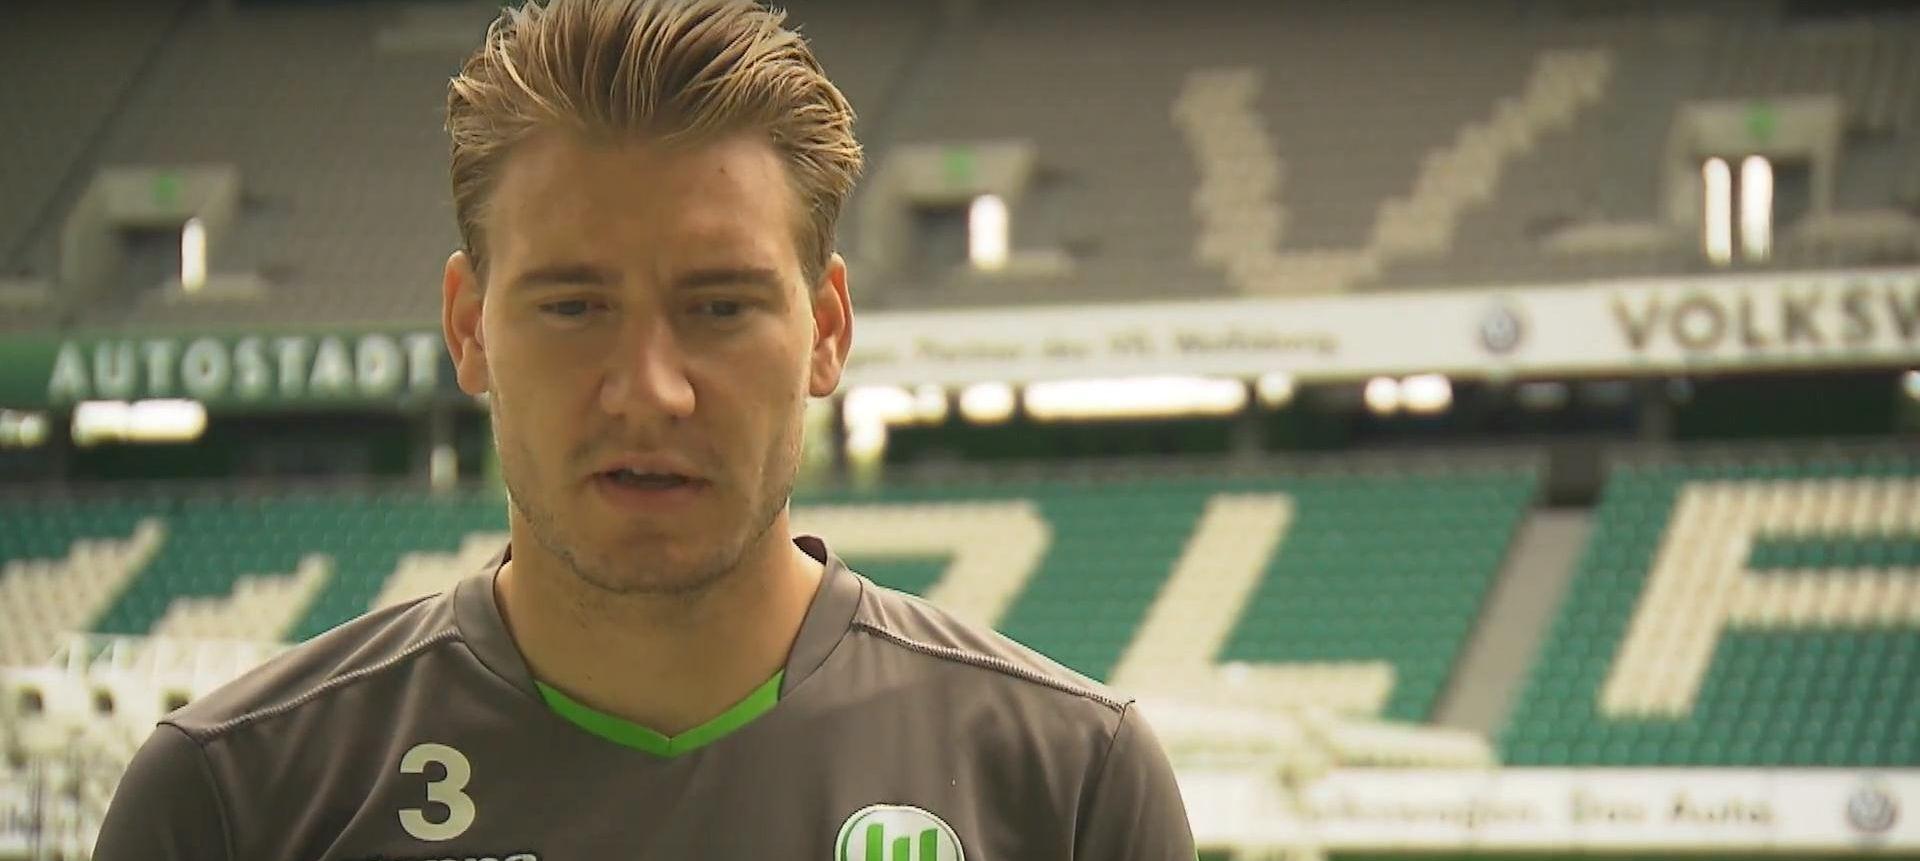 SPORAZUMNI RASKID UGOVORA Danski napadač Nicklas Bendtner napustio Wolfsburg